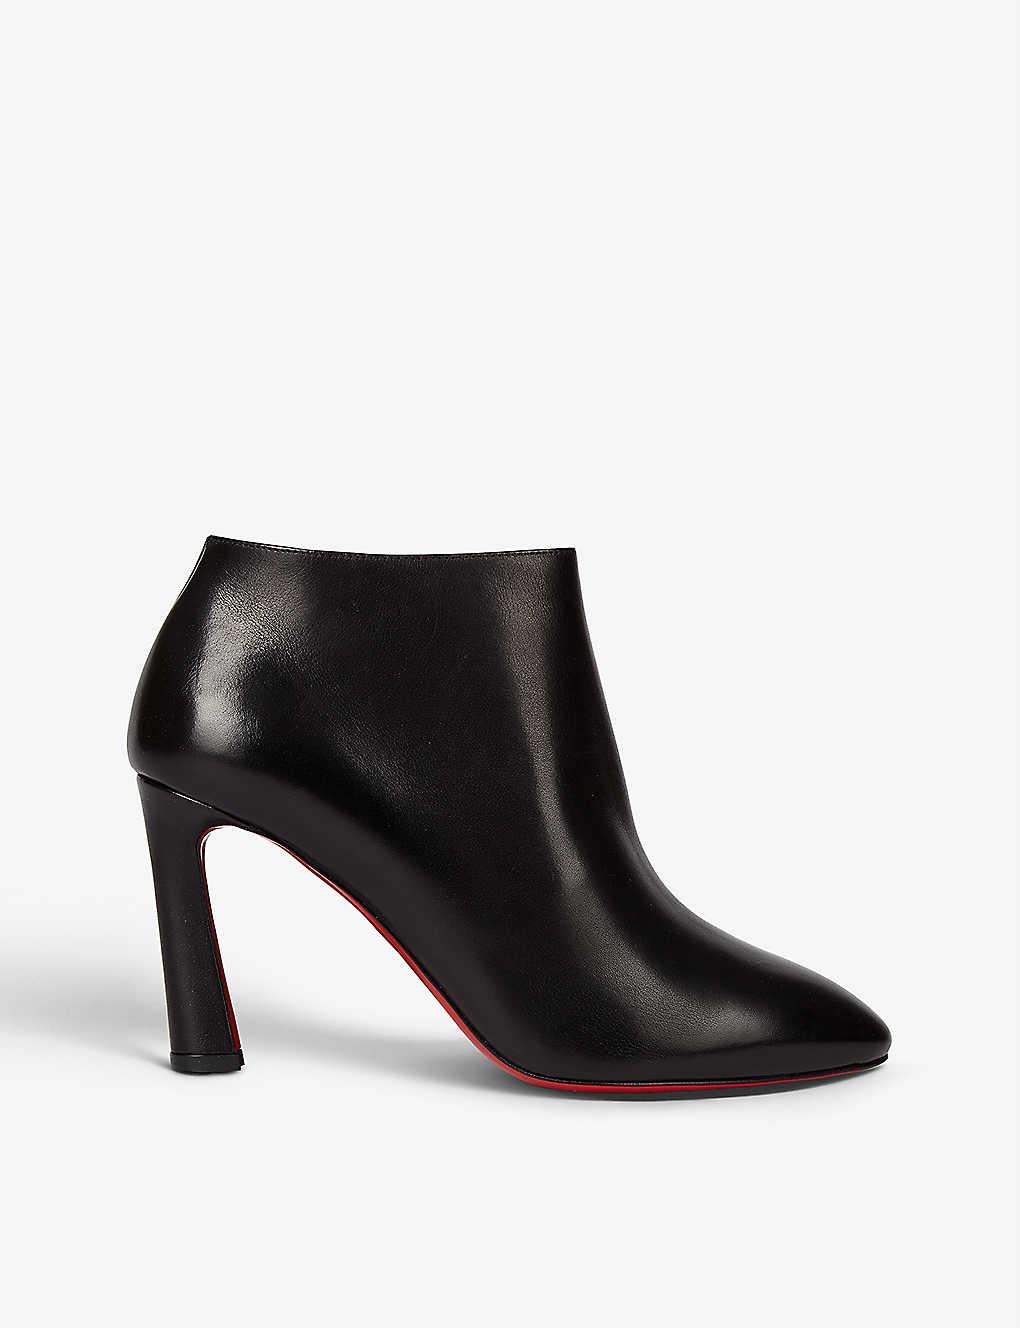 CHRISTIAN LOUBOUTIN: Eleonor 85 calf black